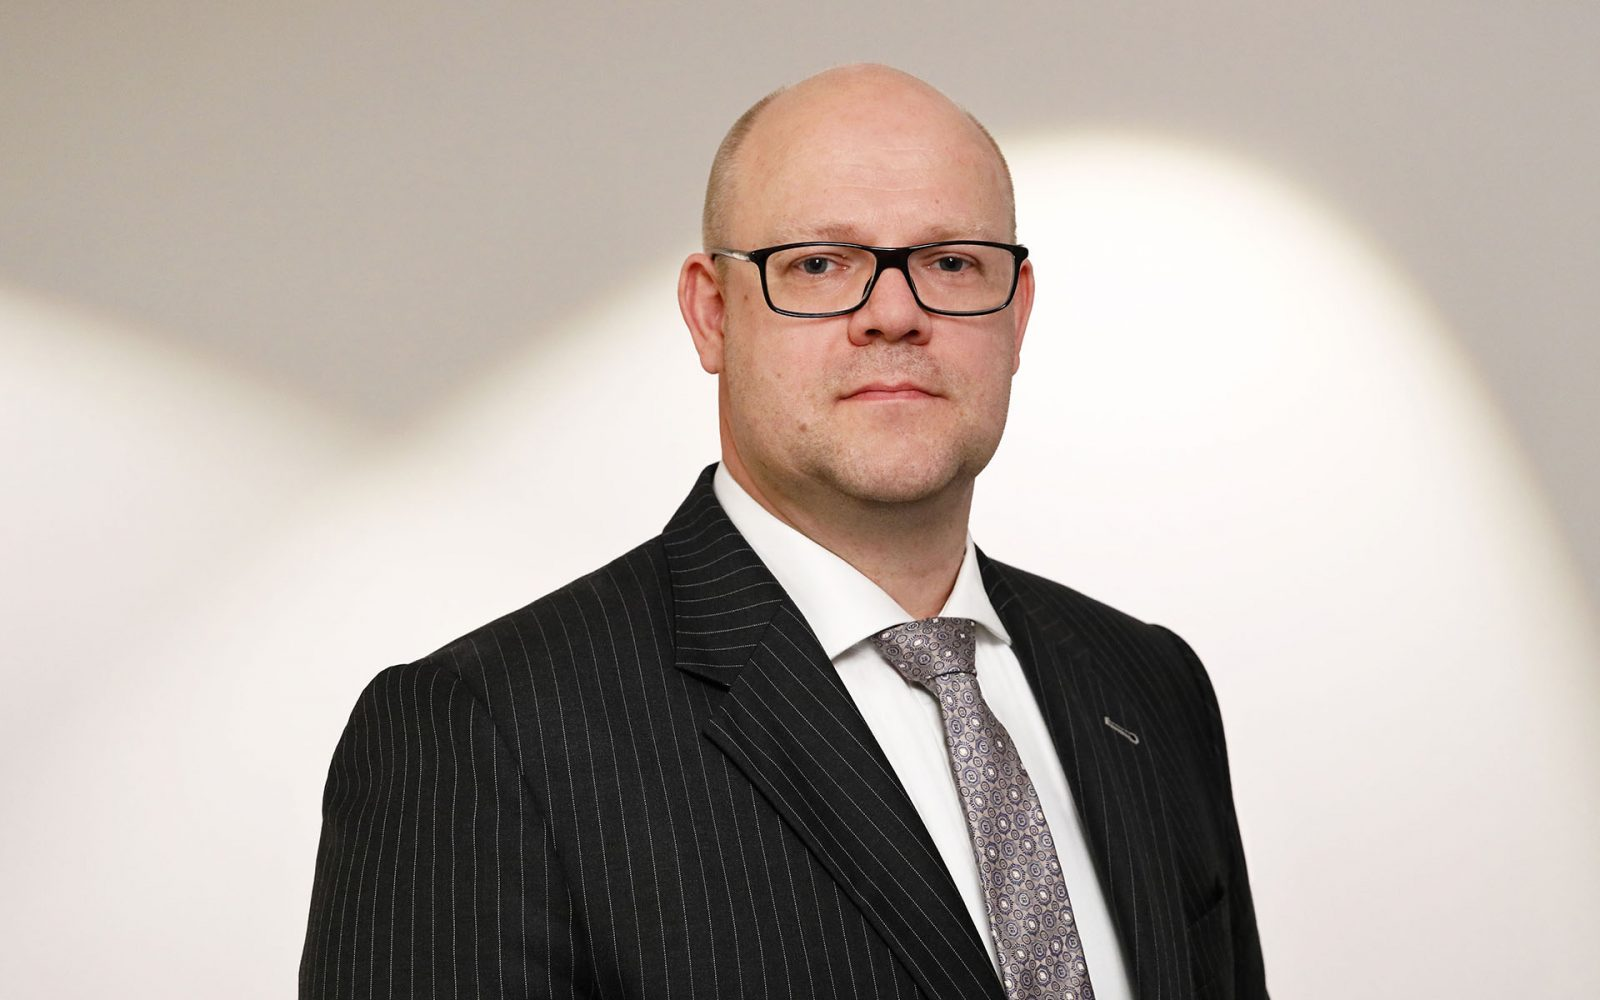 Niels-Flasshoff